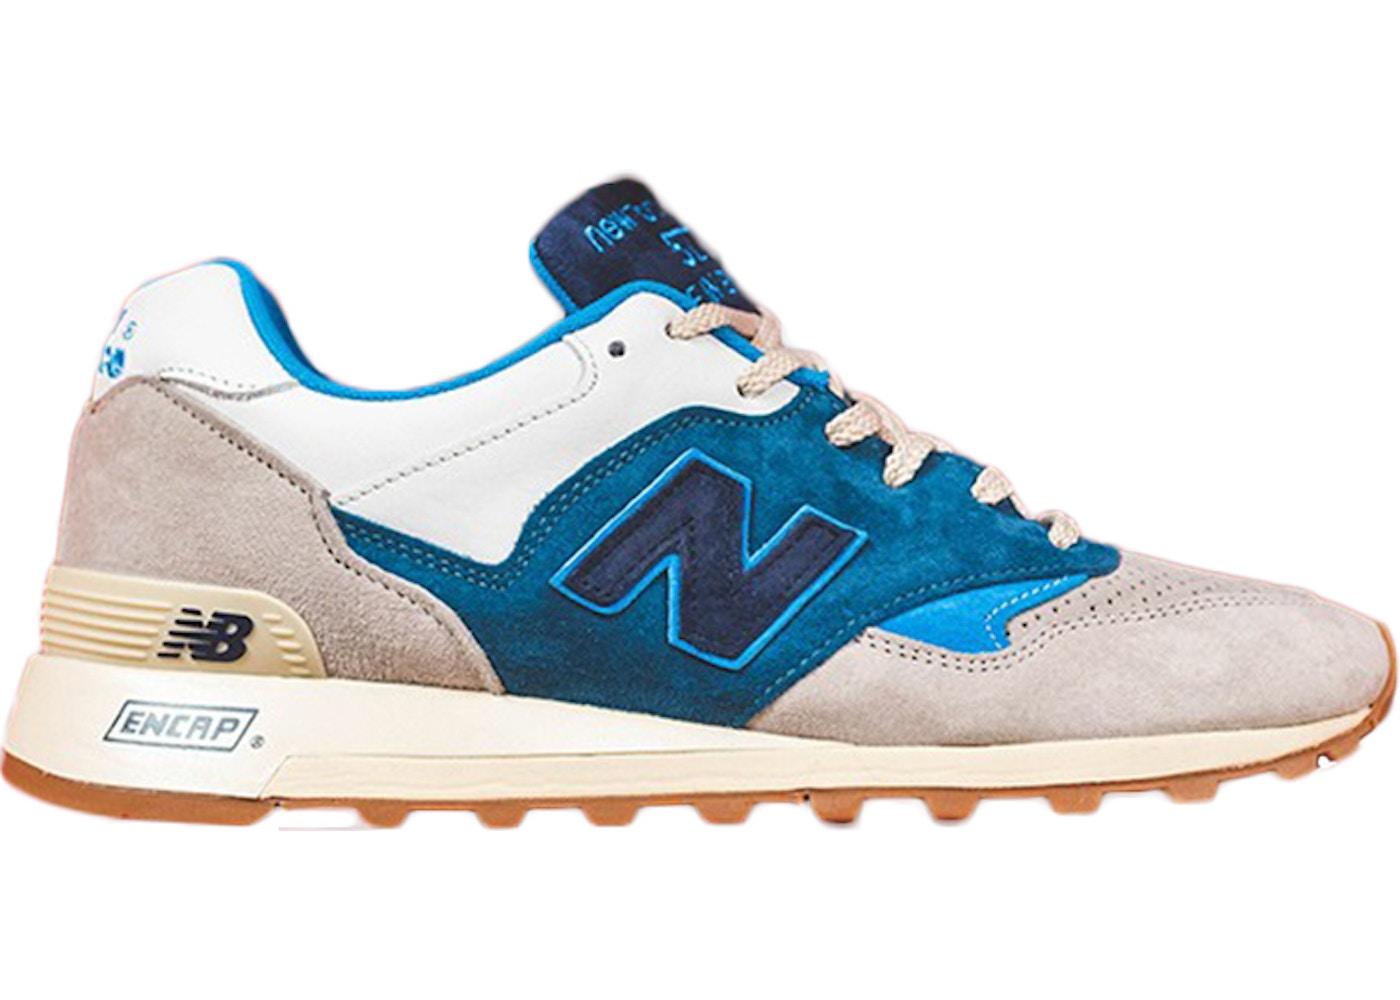 comprar new balance 577